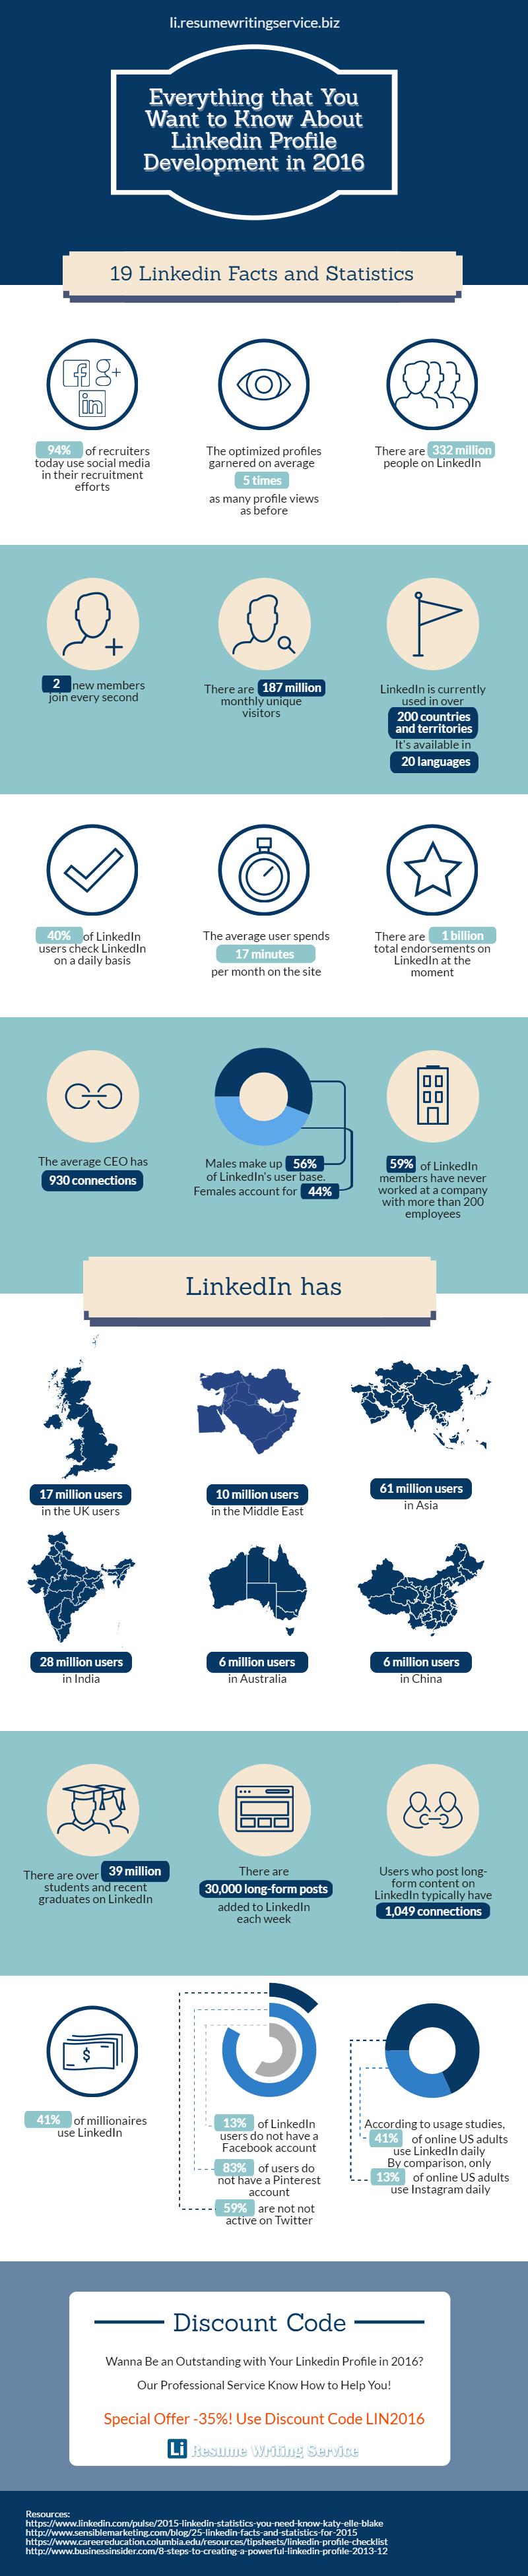 LinkedIn: datos de interés que debes conocer